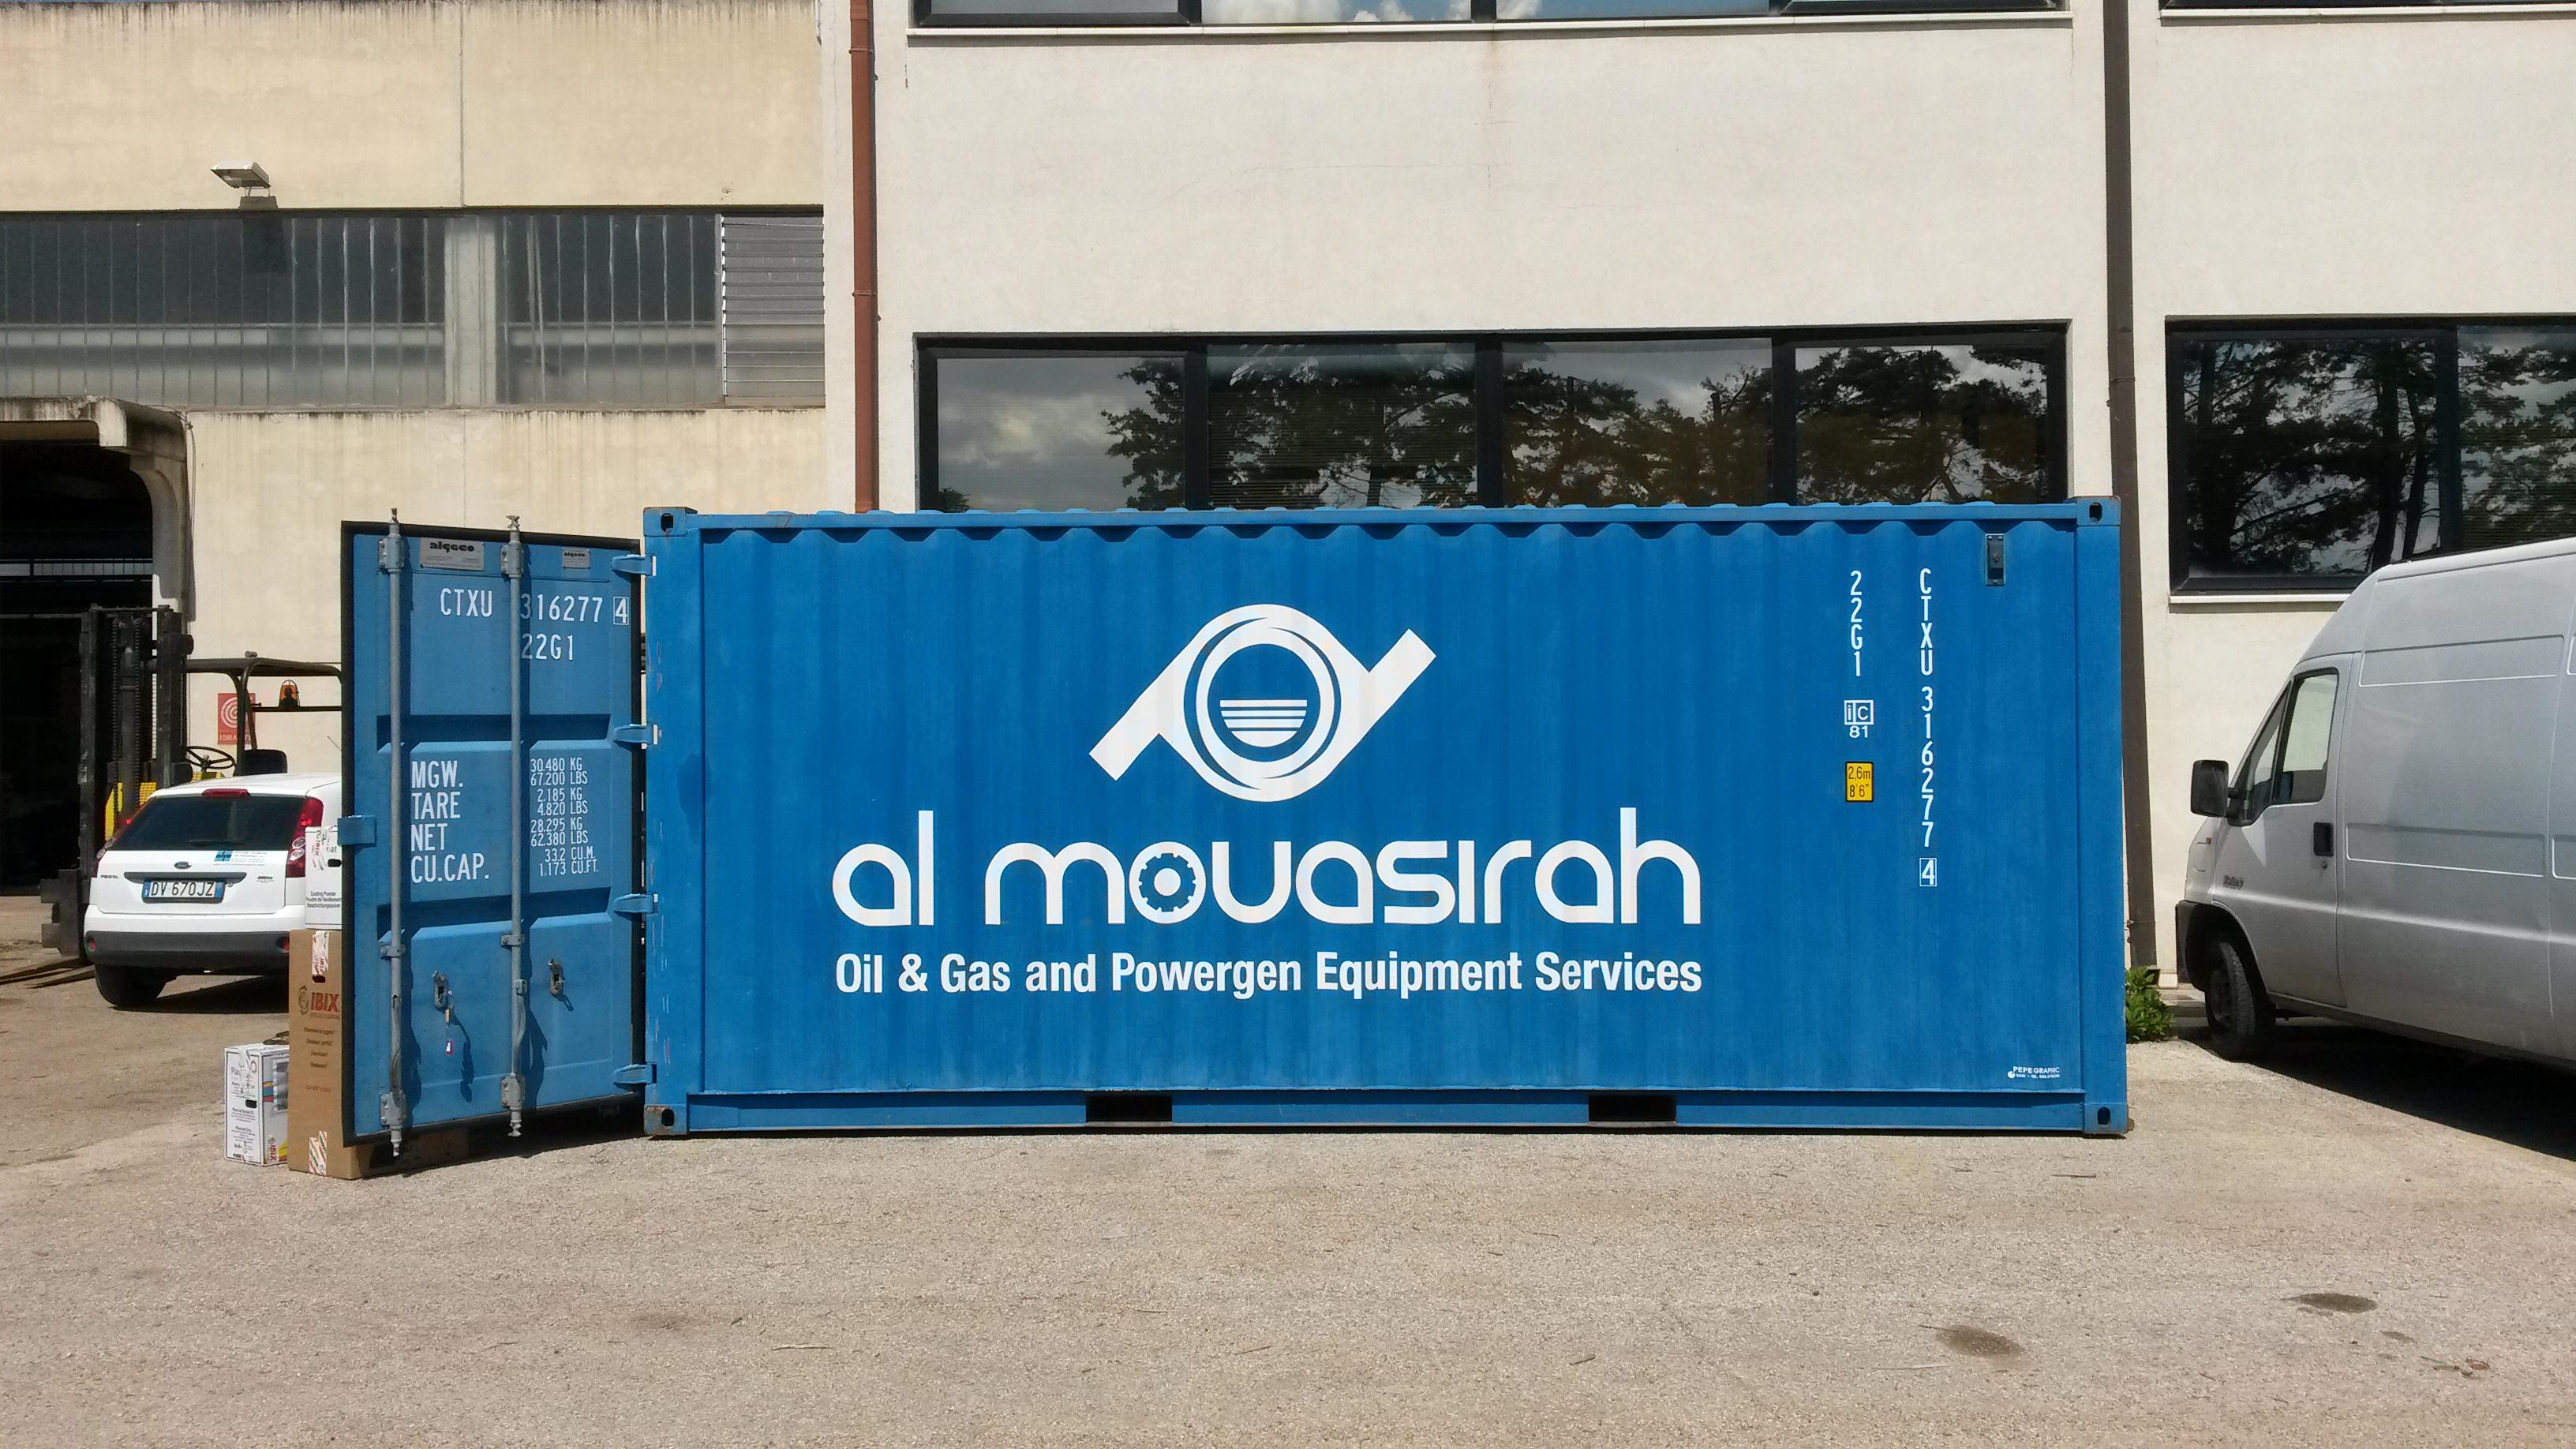 AL MOUASIRAH